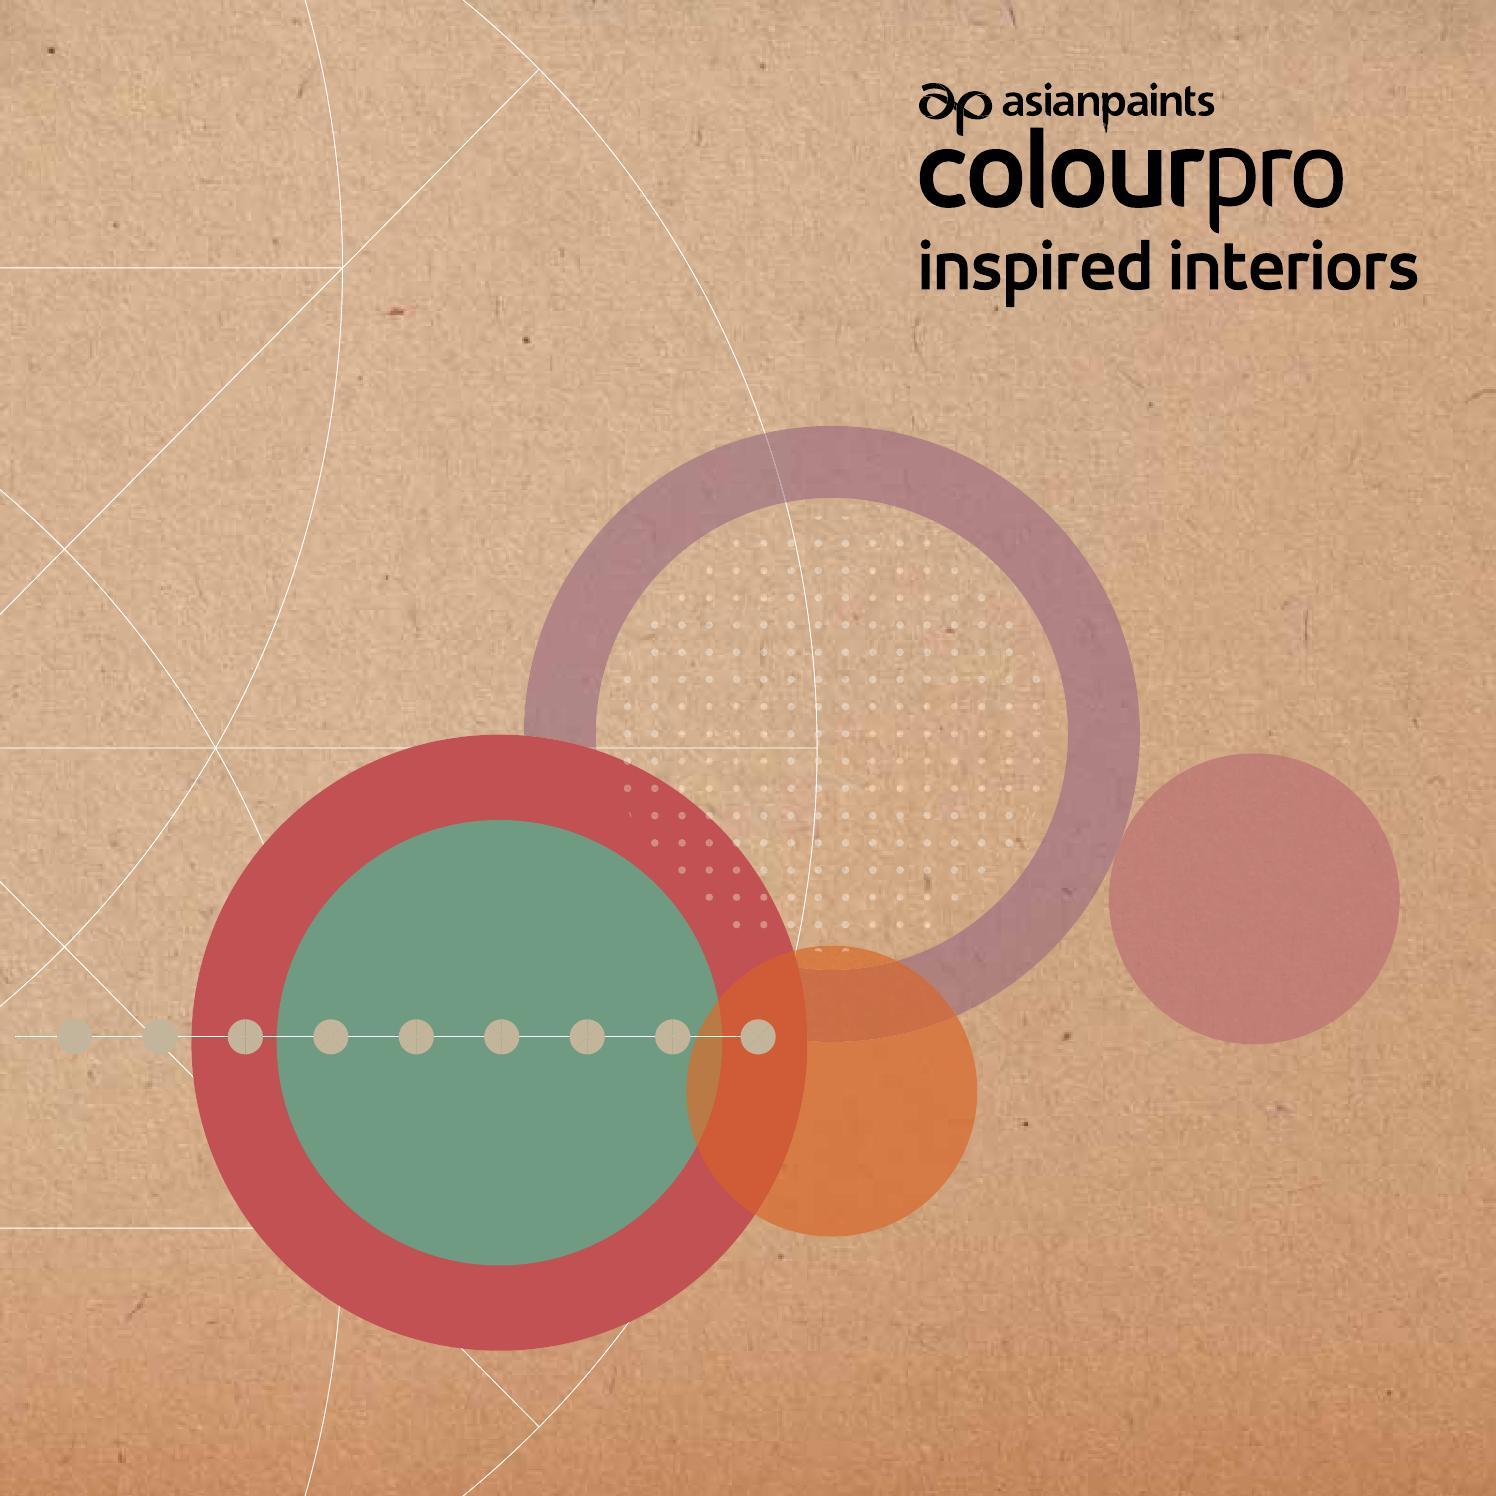 Asian Paints Interior Colour Combination Catalogue Pdf: Asian Paints, Colour Pro Inspired Interiors- Book By Tsk